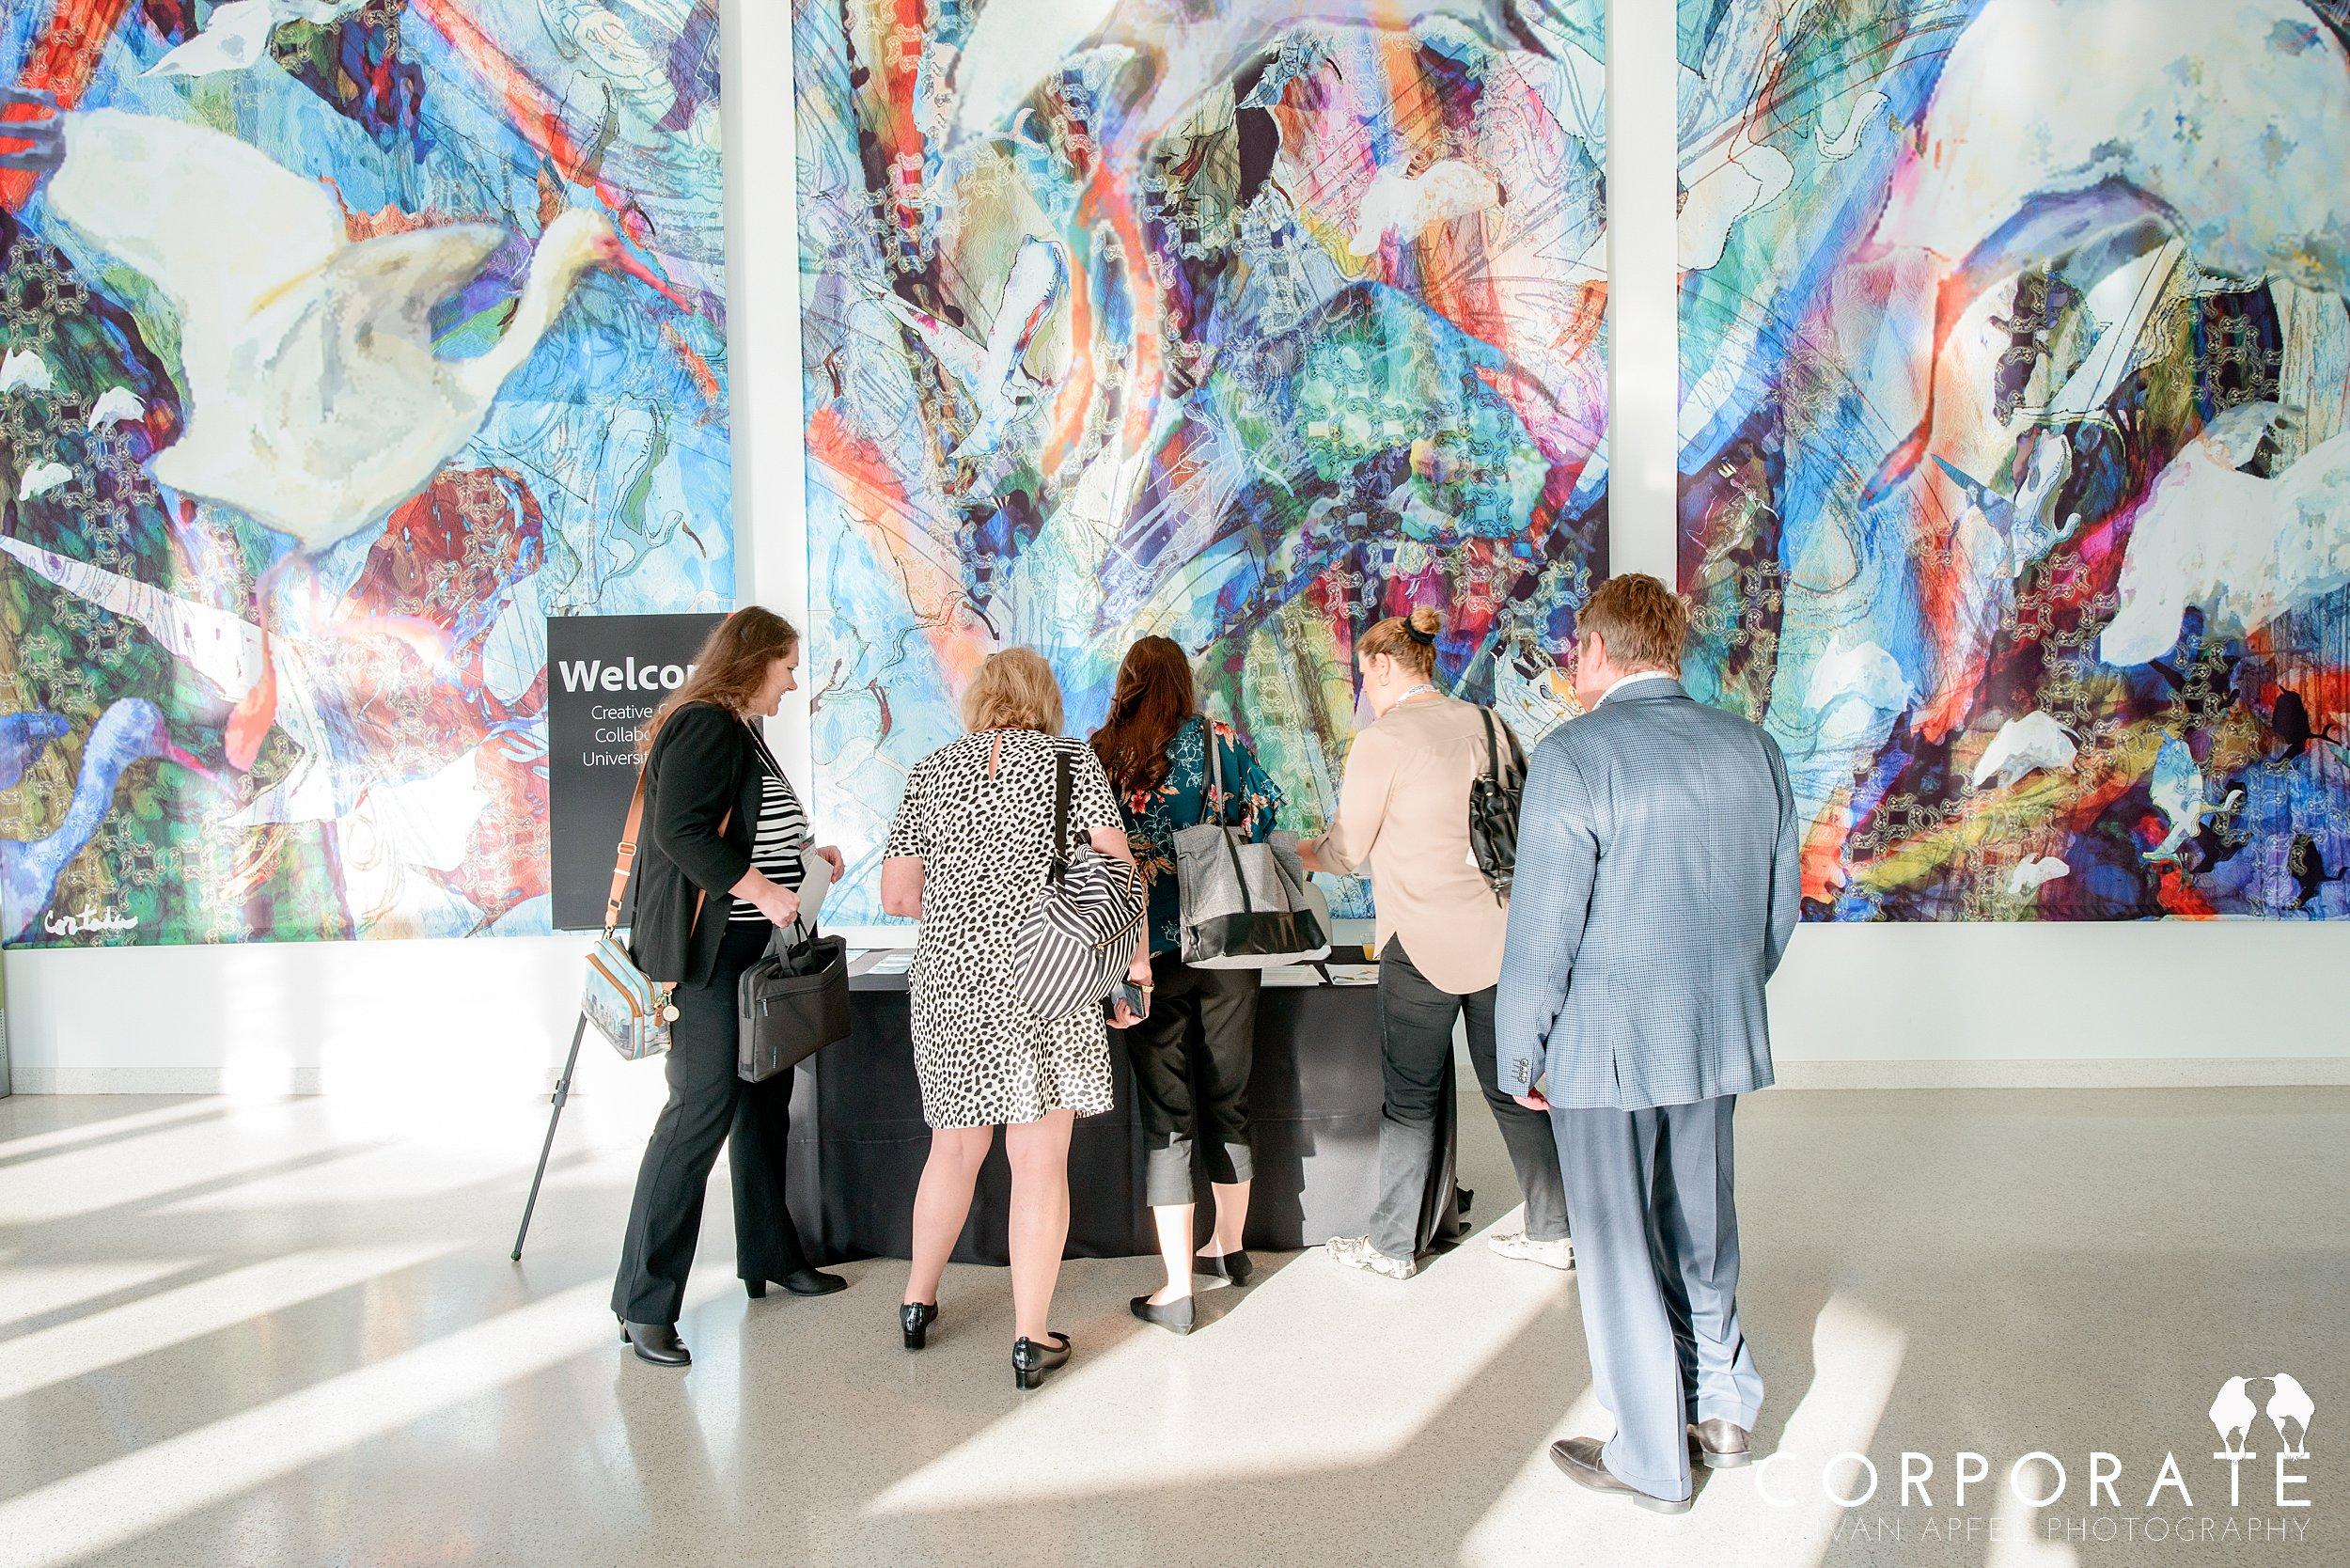 Miami Corporate Event Photographer Adobe Systems Creative Campus 2019-D2_Adobe_Creative_Campus_UMiami-_IAP8252.jpg